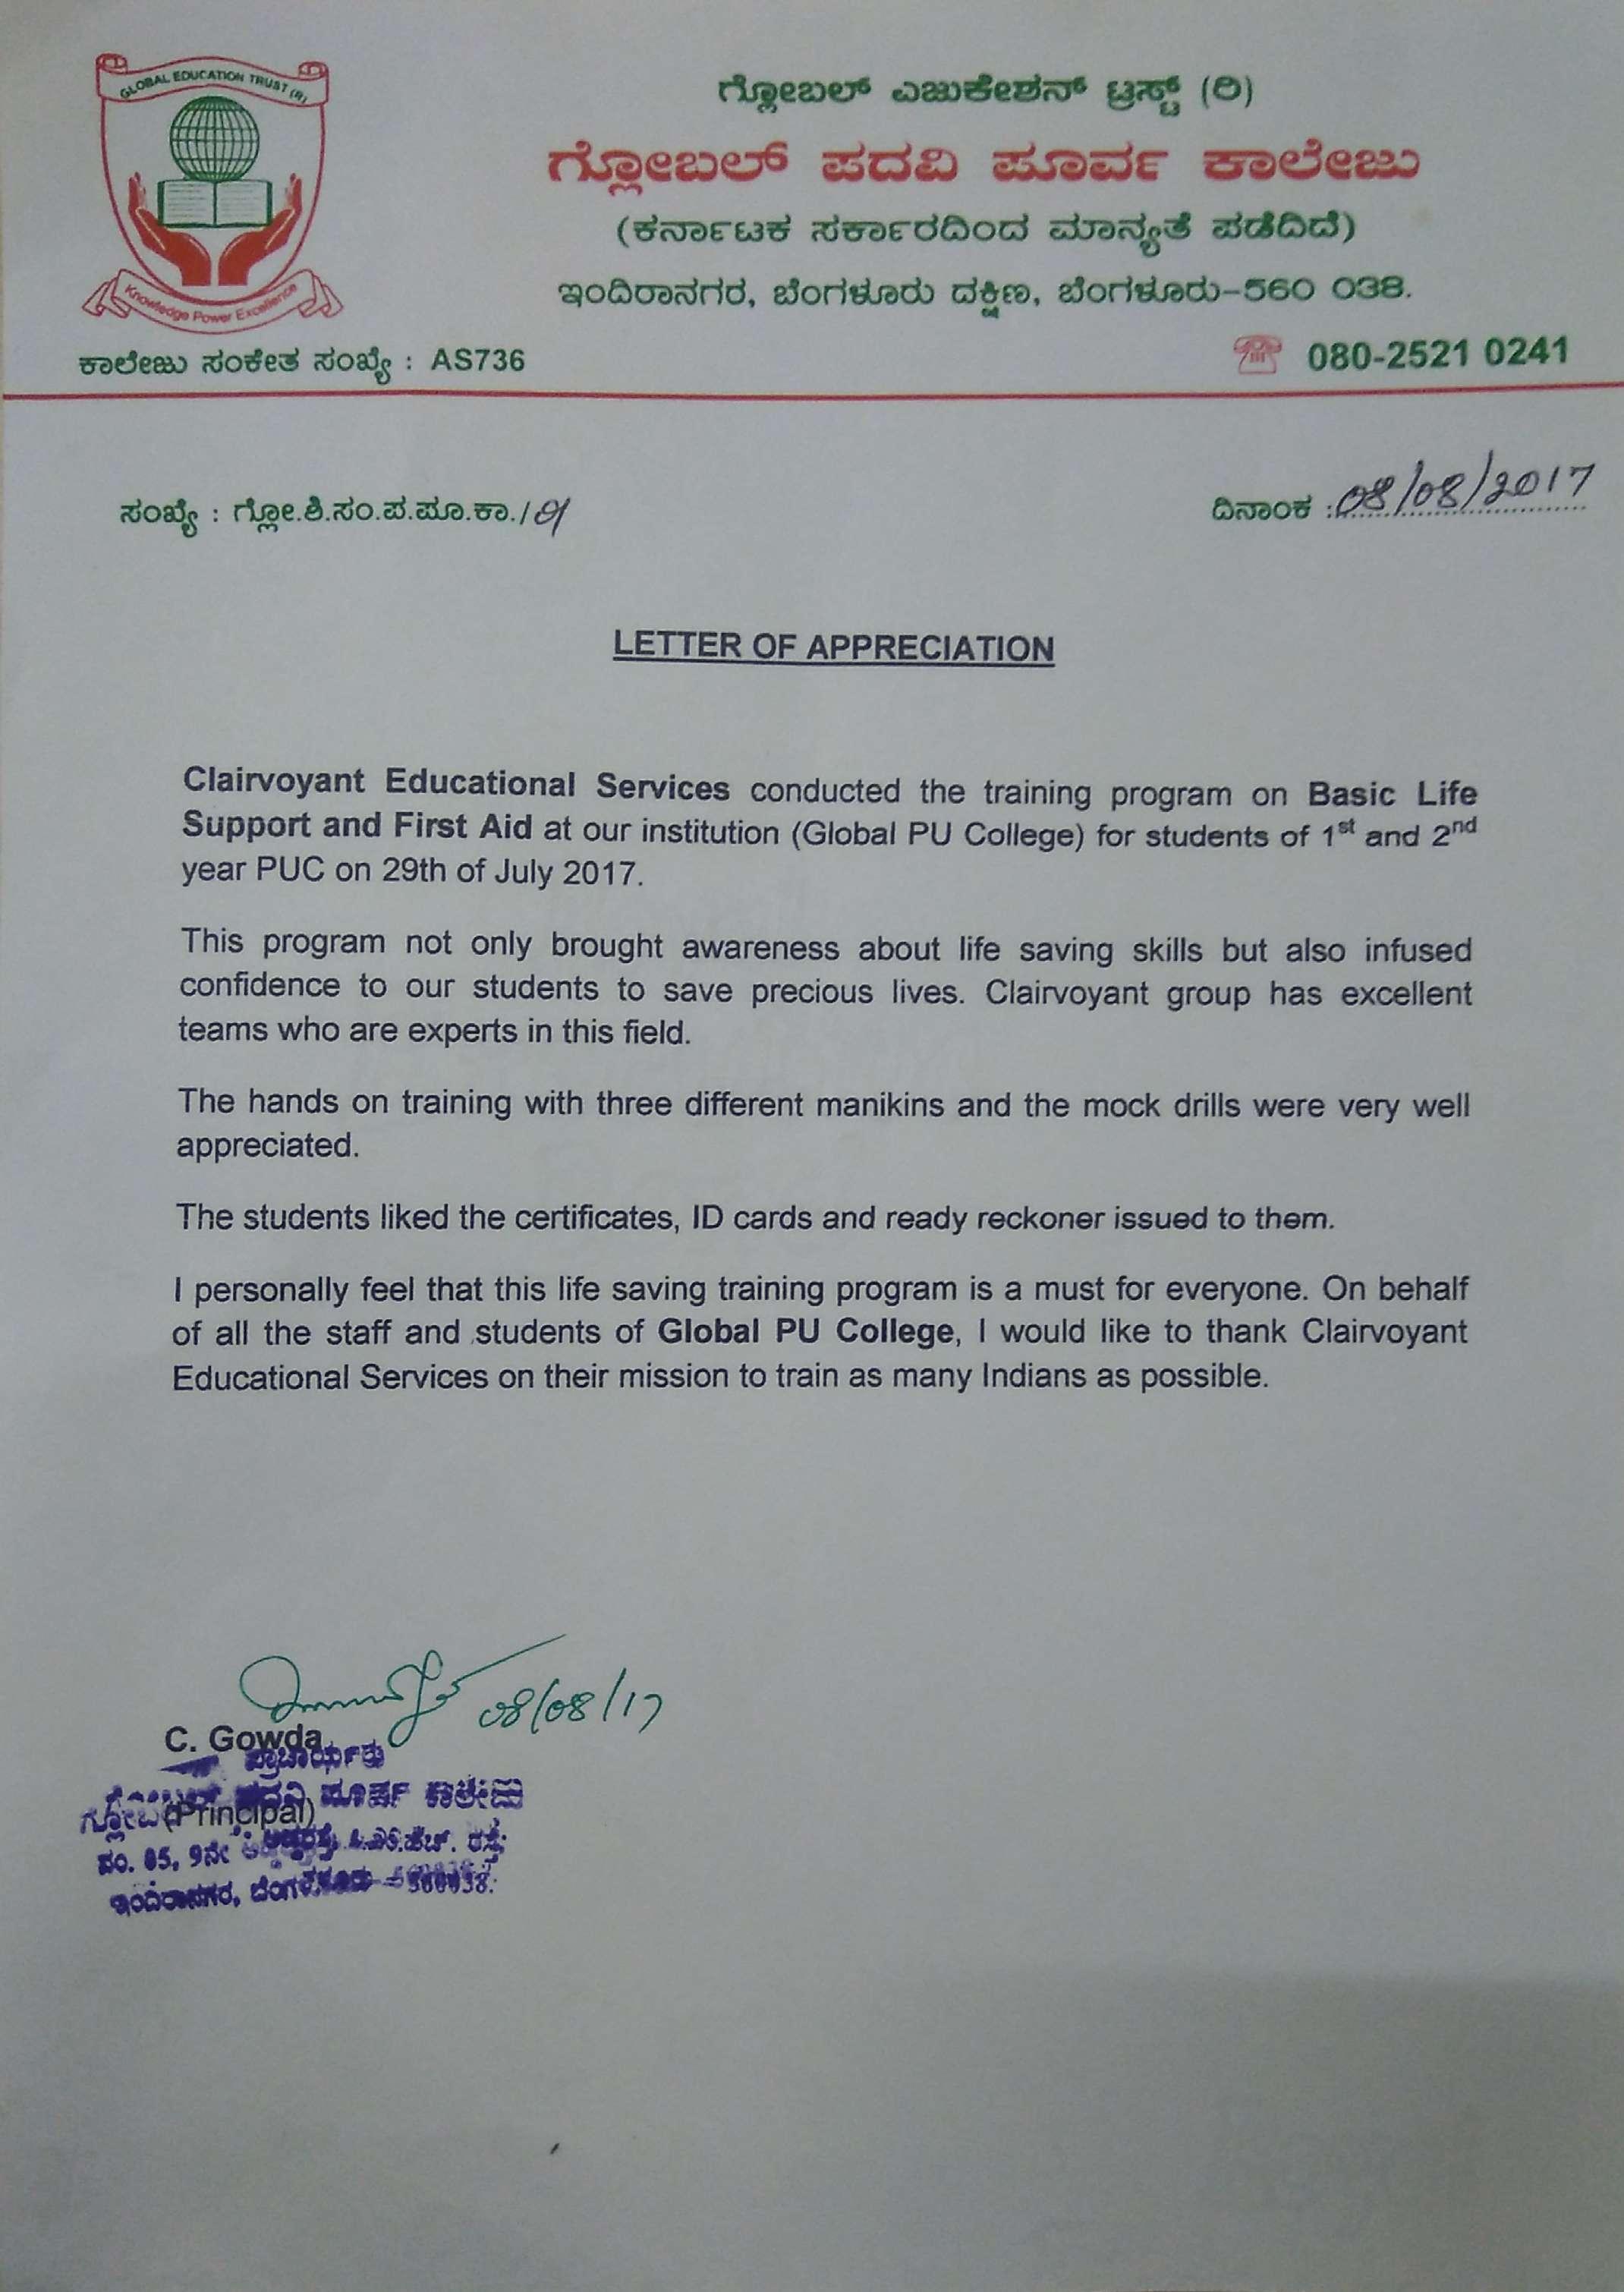 Letter Of Appreciation From Global Pu College Indiranagar